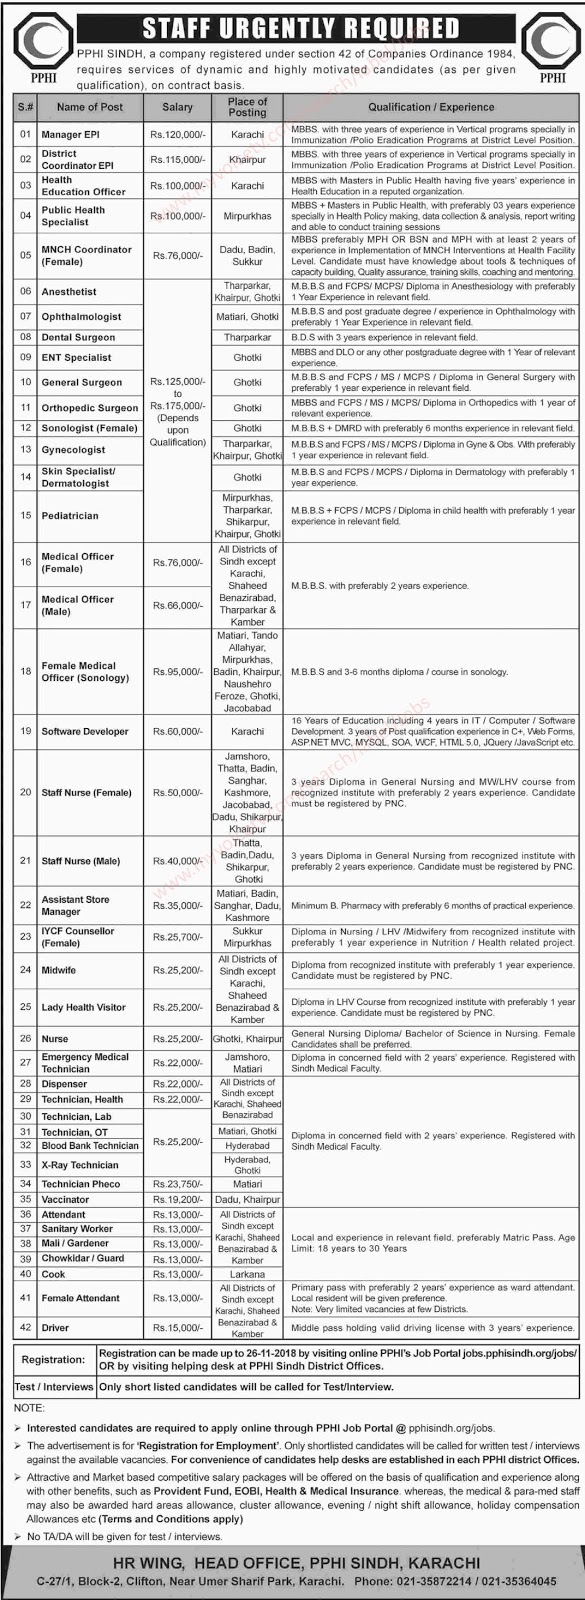 #Jobs - #Career_Opportunities #Jobs at PPHI Sindh for medical professionals including Nurses - Get registered by 26 Nov 2018 - for details visit the link